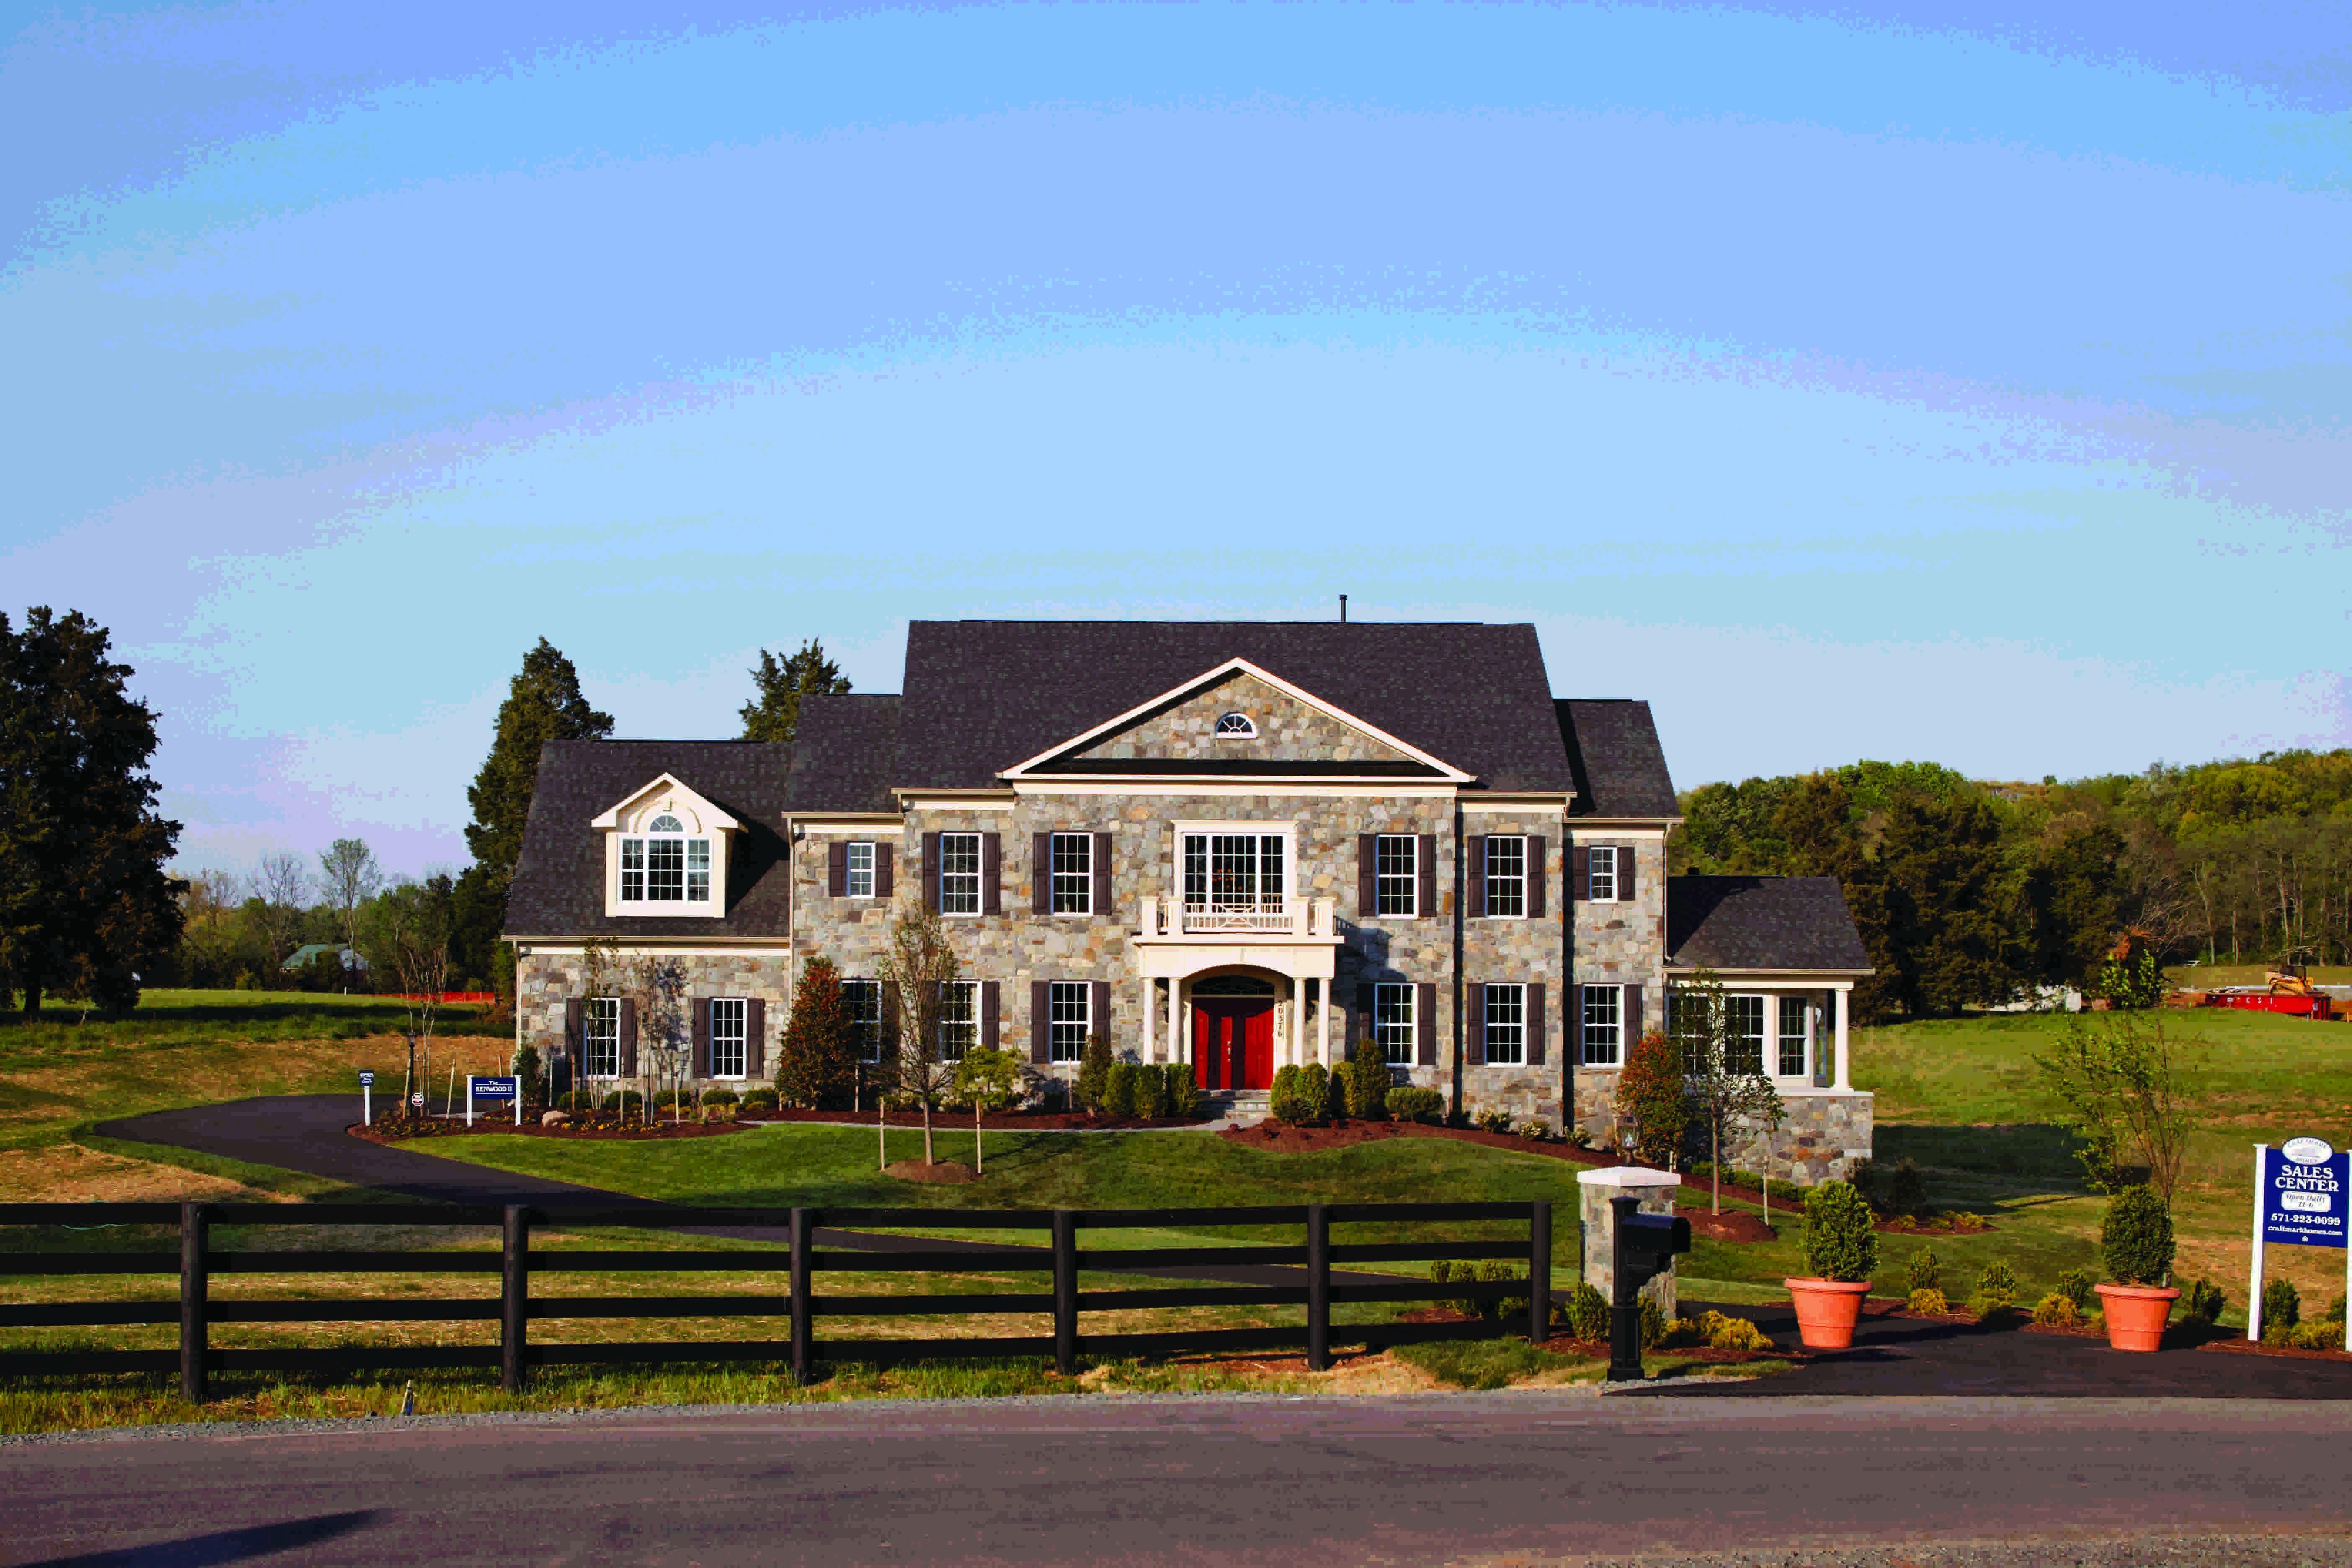 The Kenwood II by Craftmark Homes